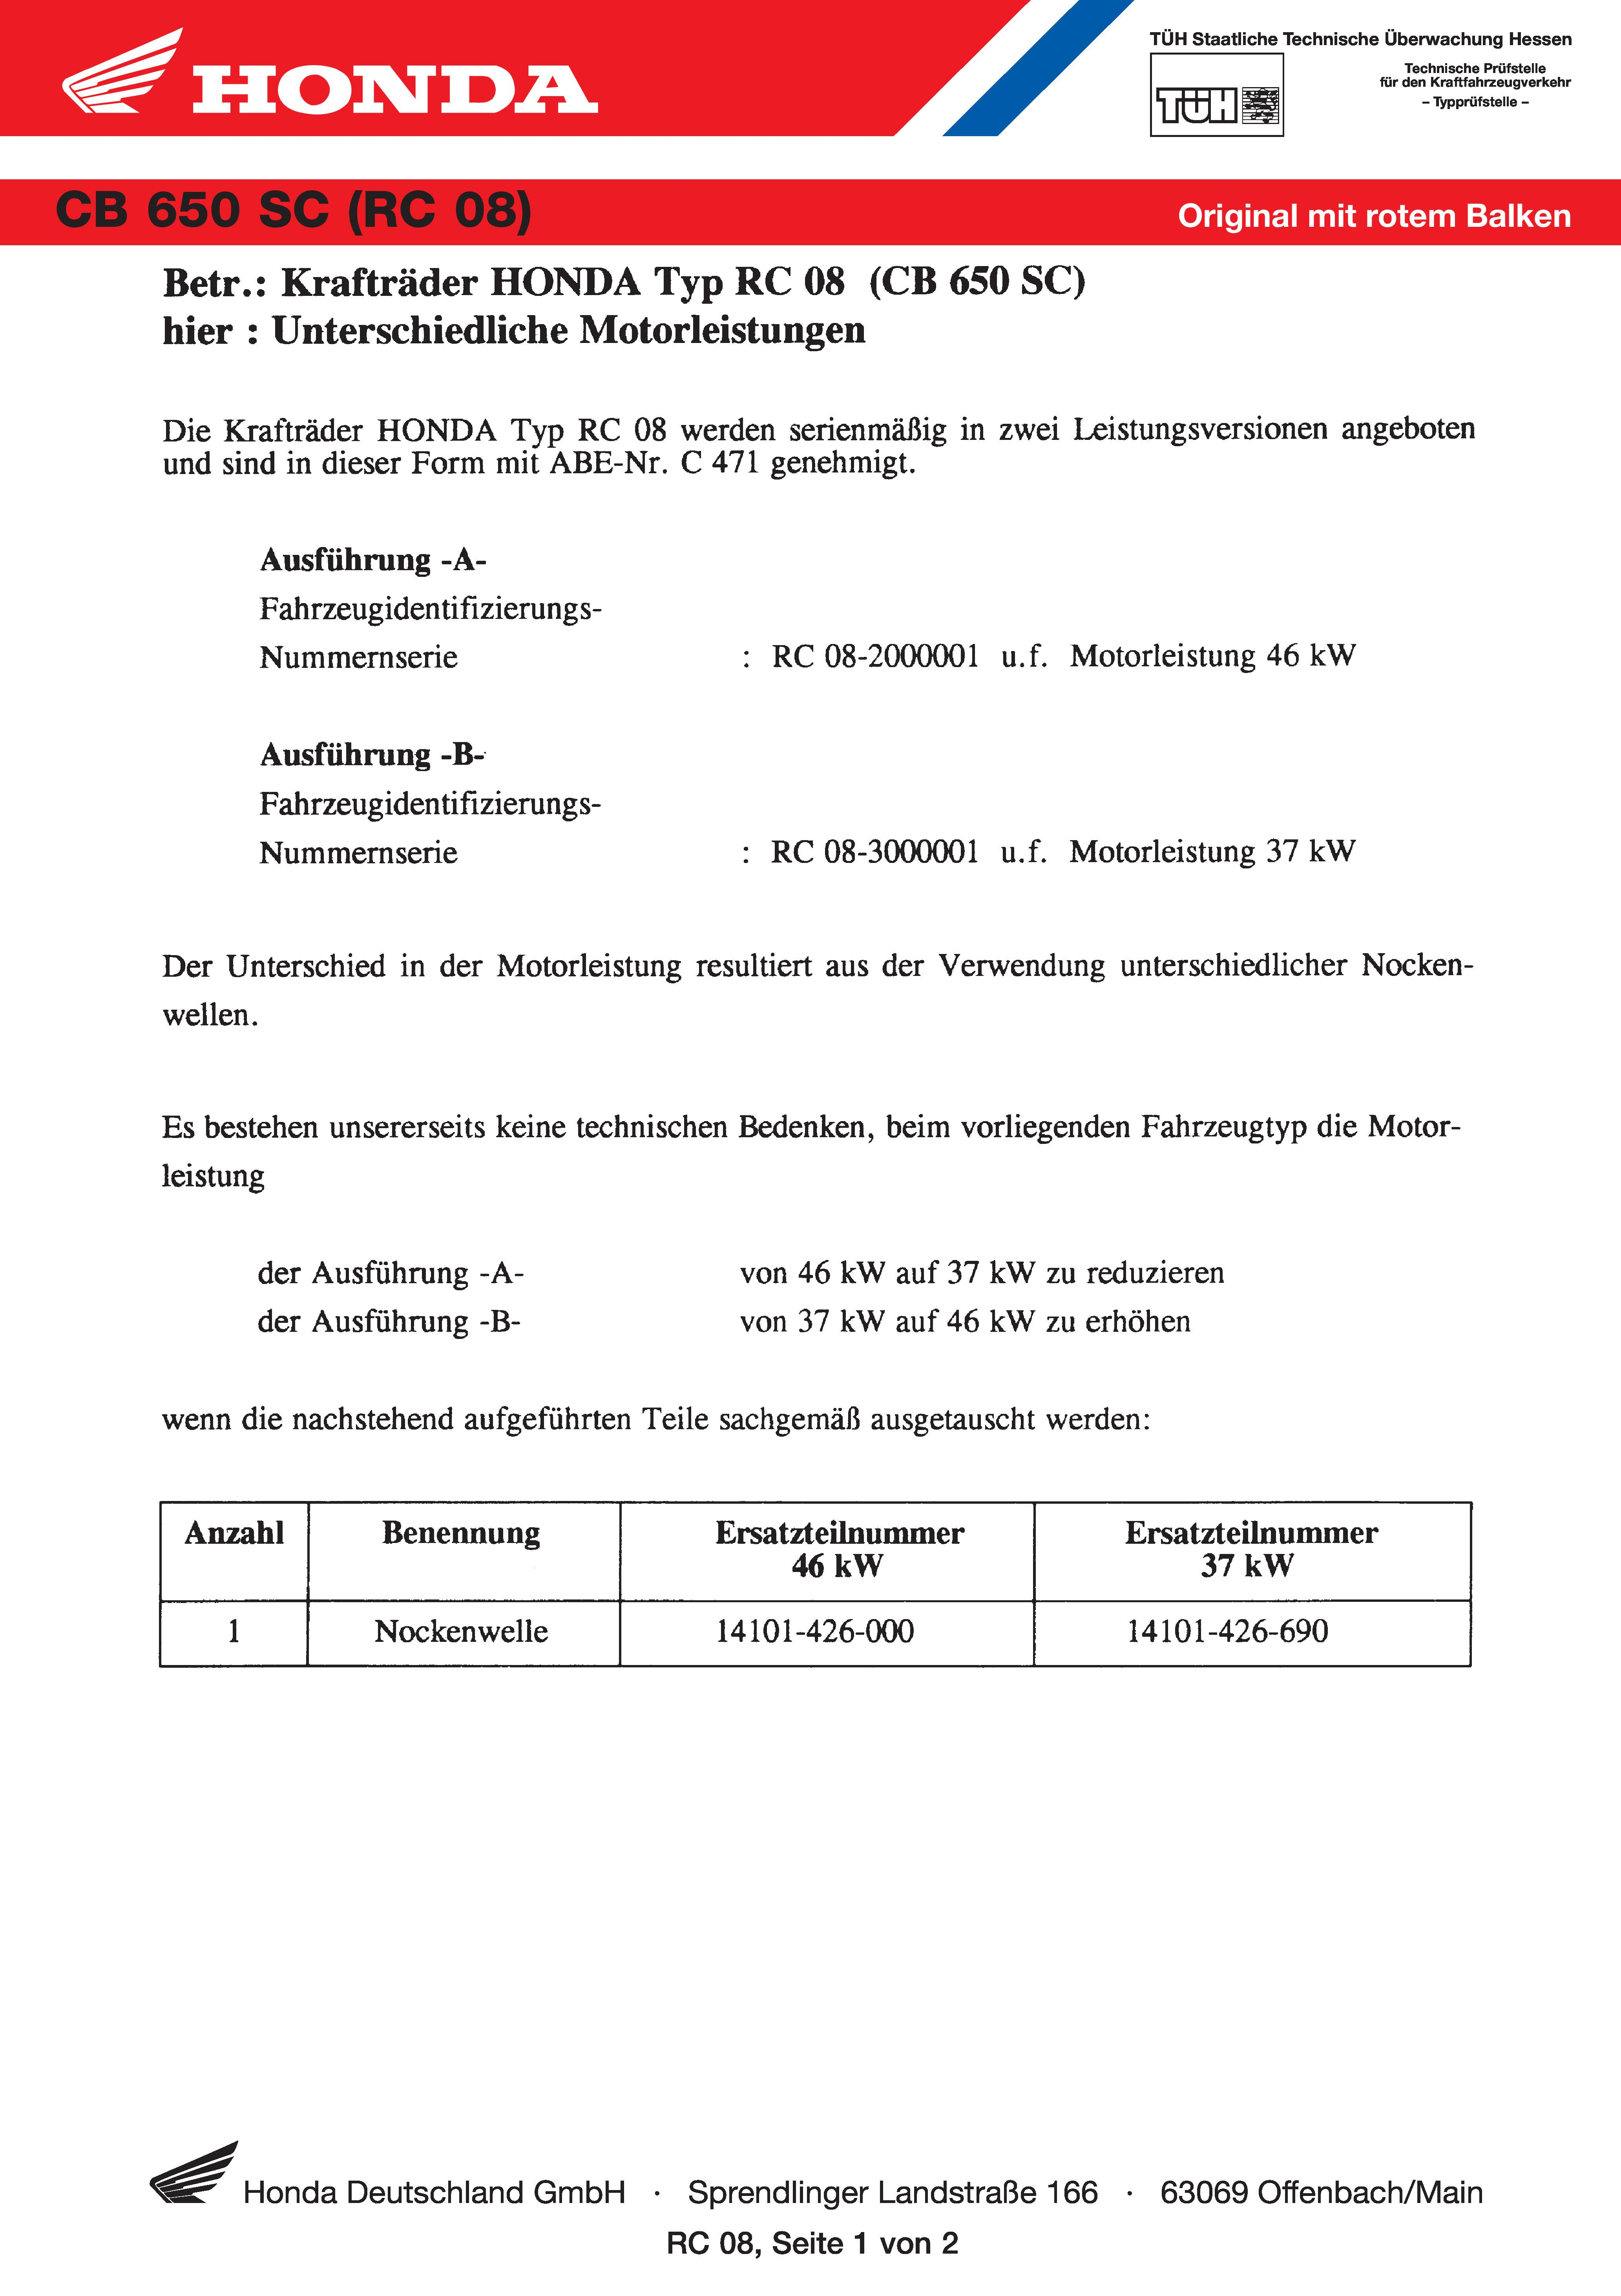 Conformity declaration Honda CB650SC RC08 (Germany) (1978)